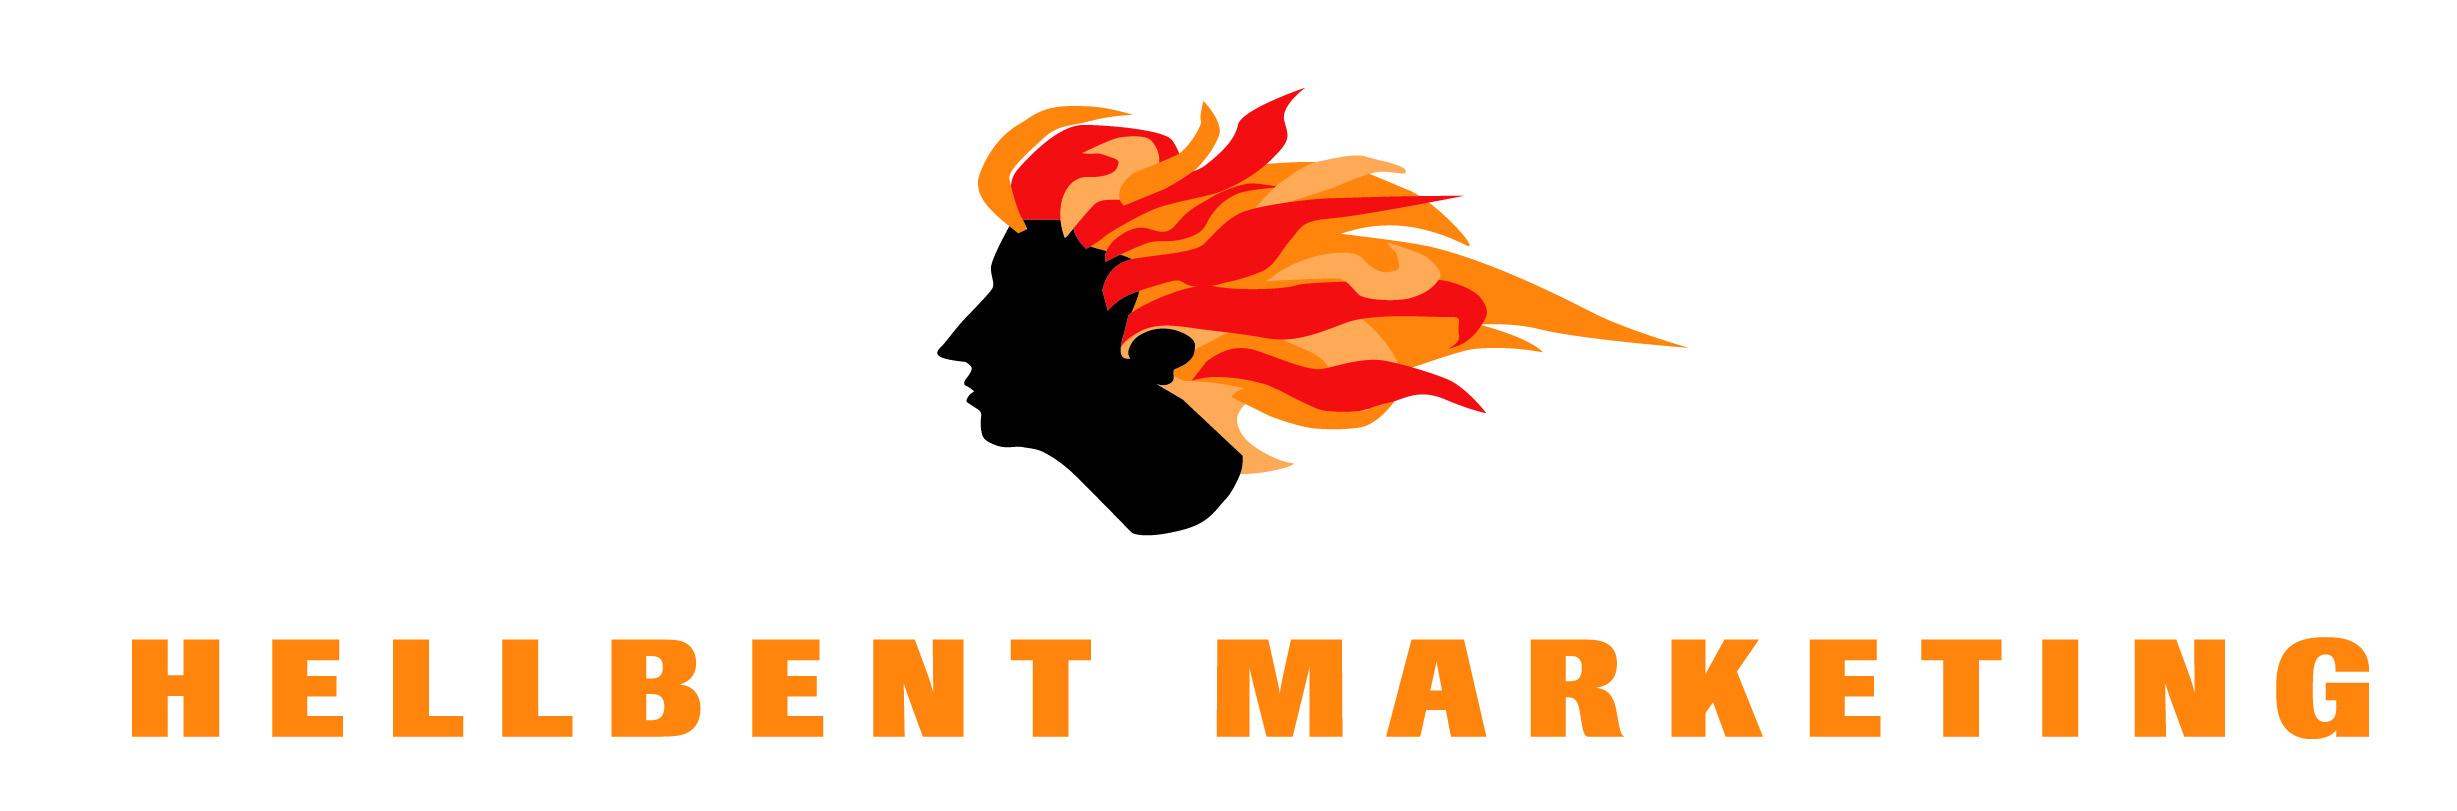 hellbent logo